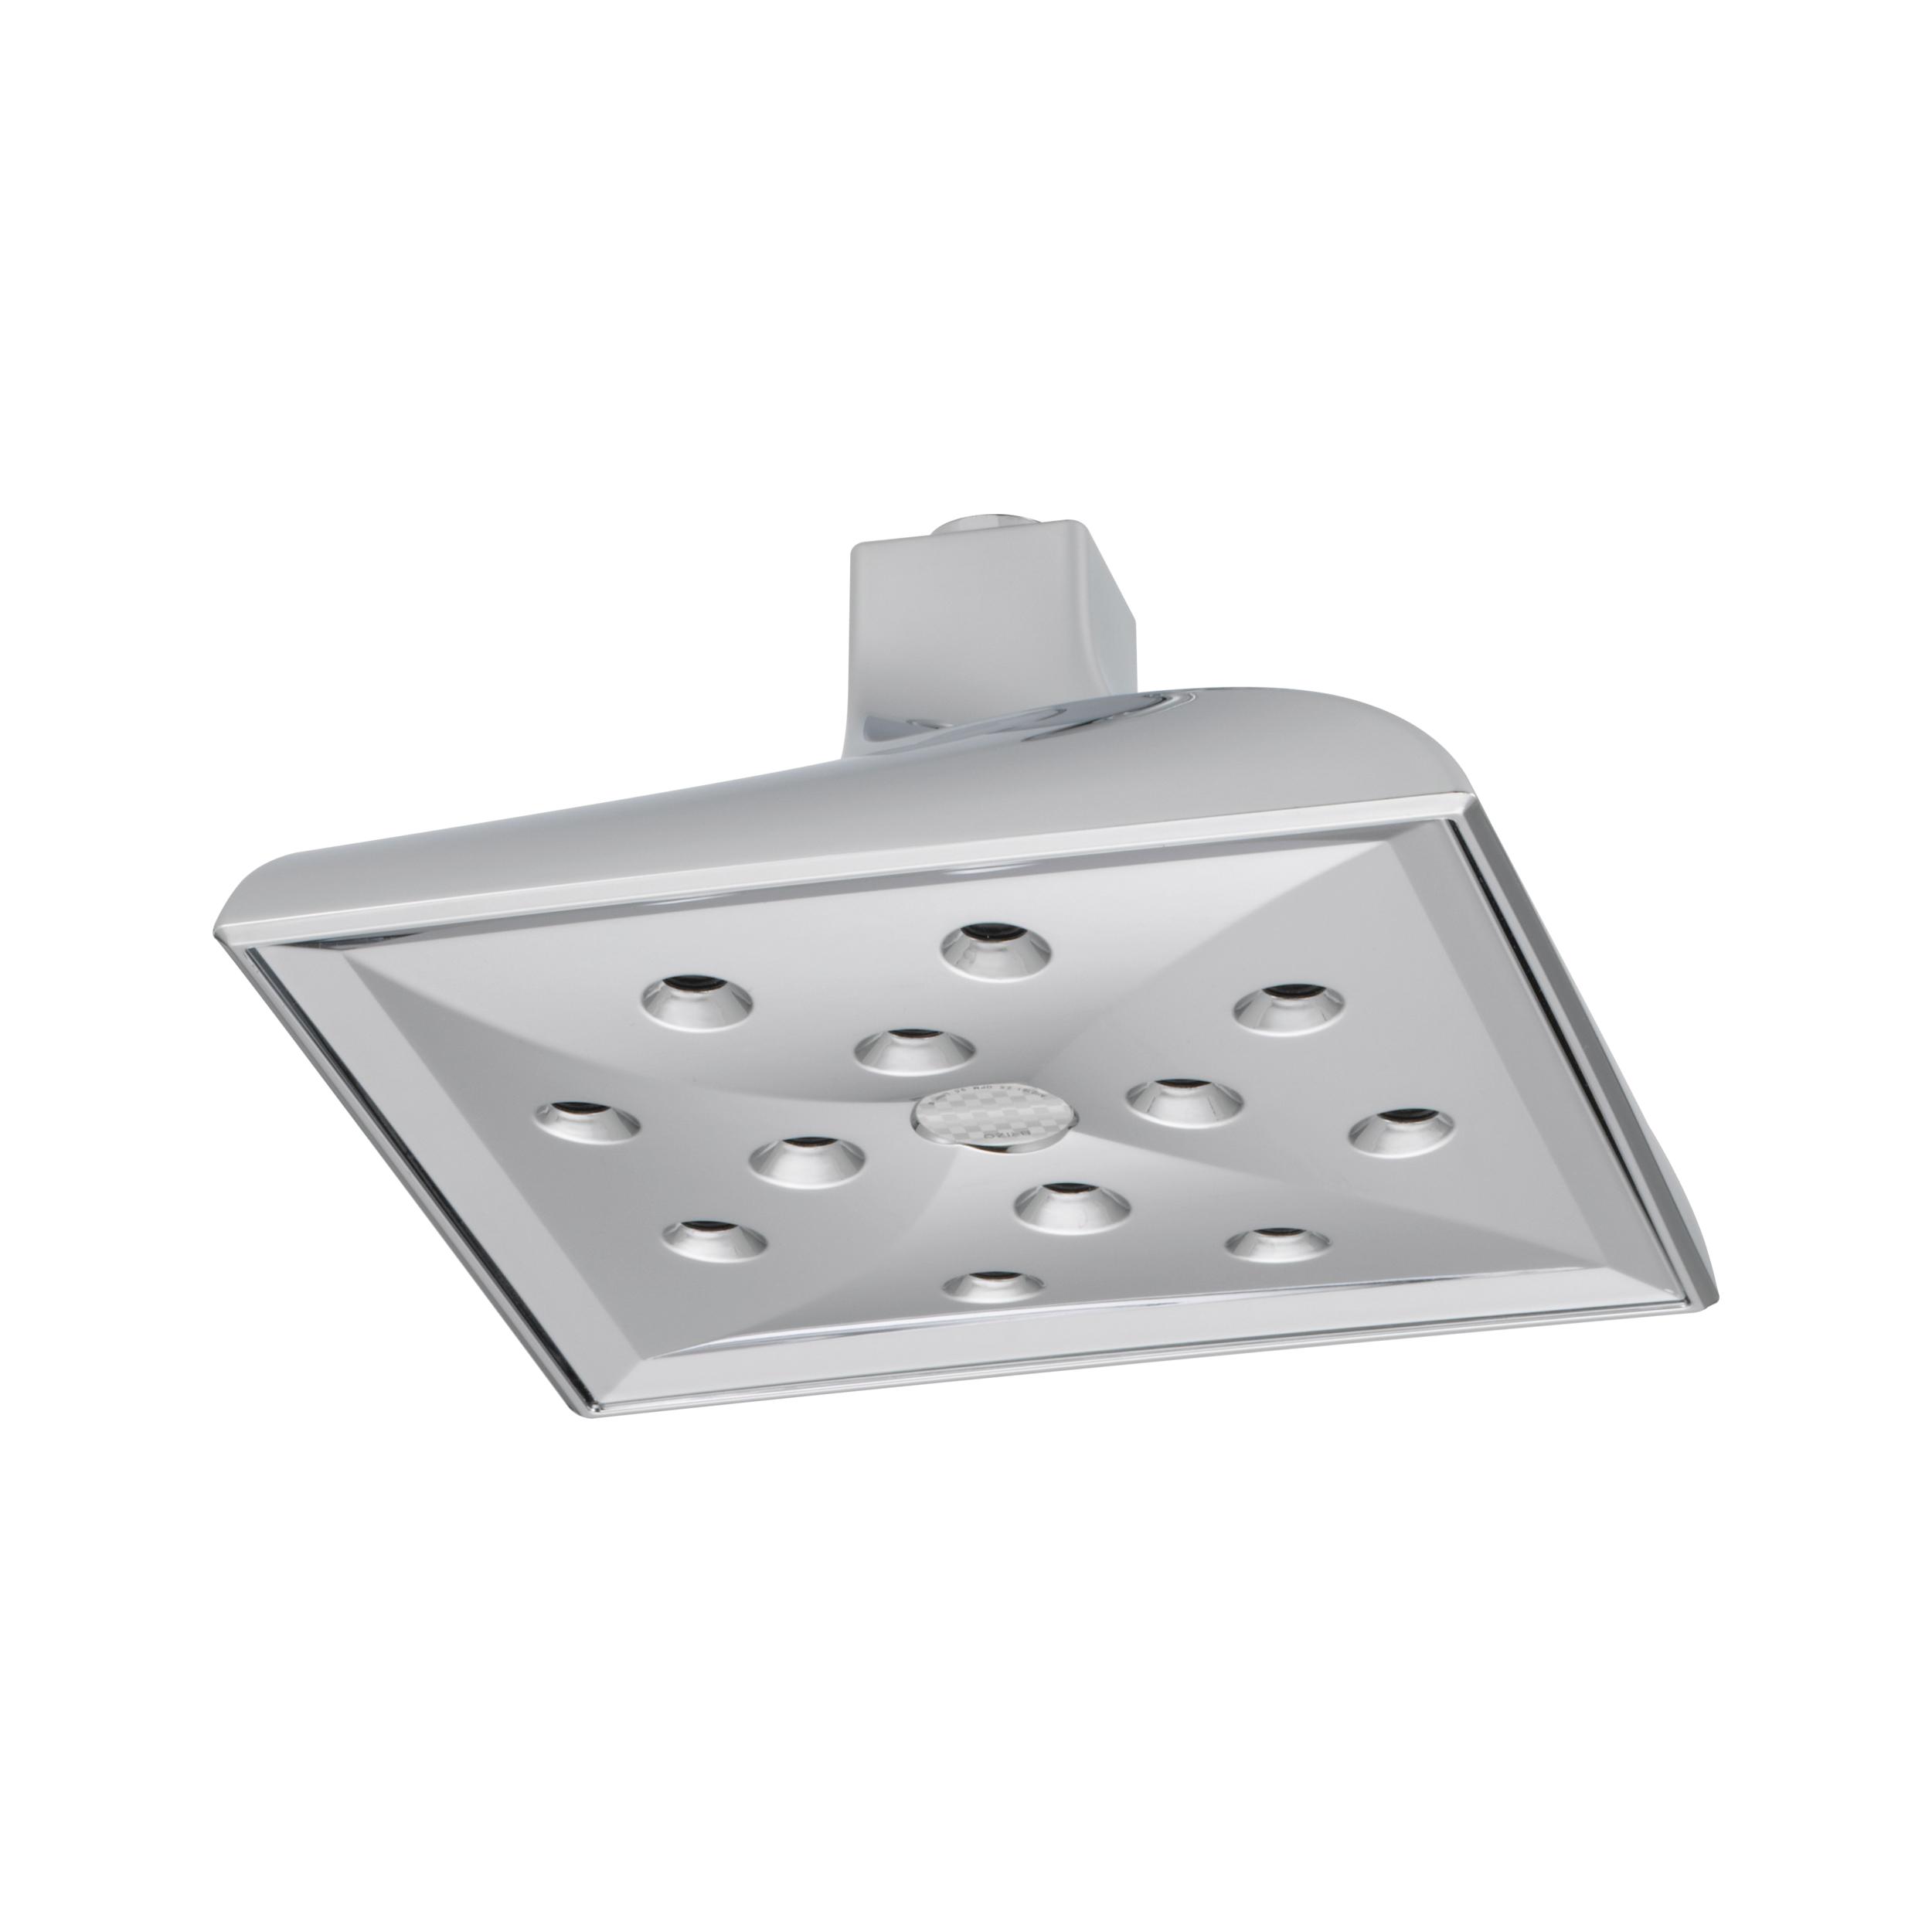 Brizo® 81330-PC-ECO Virage® Raincan Shower Head, 2 gpm Maximum, 1 Spray, Ceiling Mount, 8 in L x 8 in W x 3-3/4 in H Head, Domestic